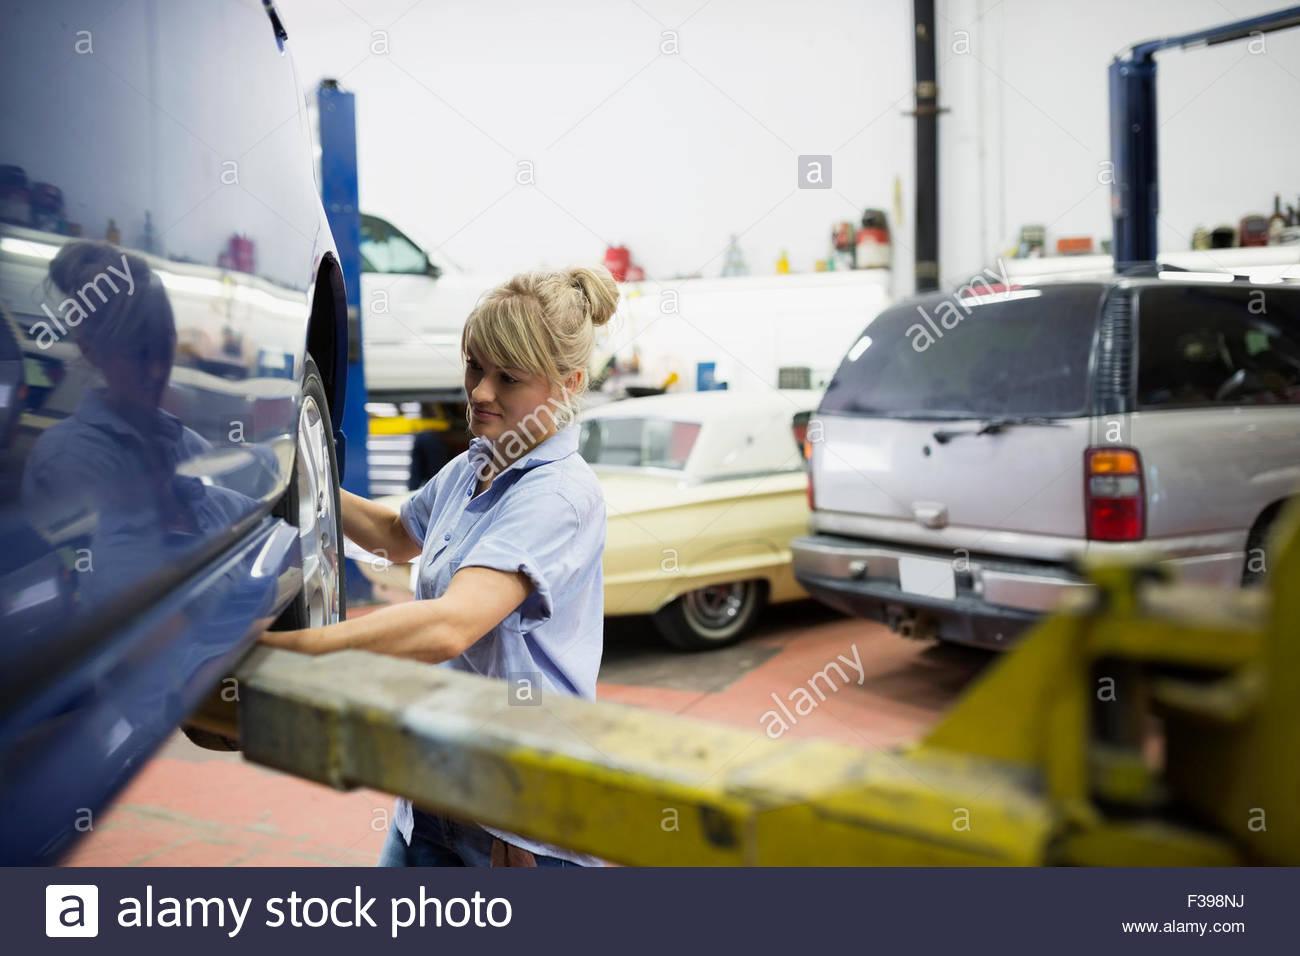 Female mechanic replacing tire on car - Stock Image